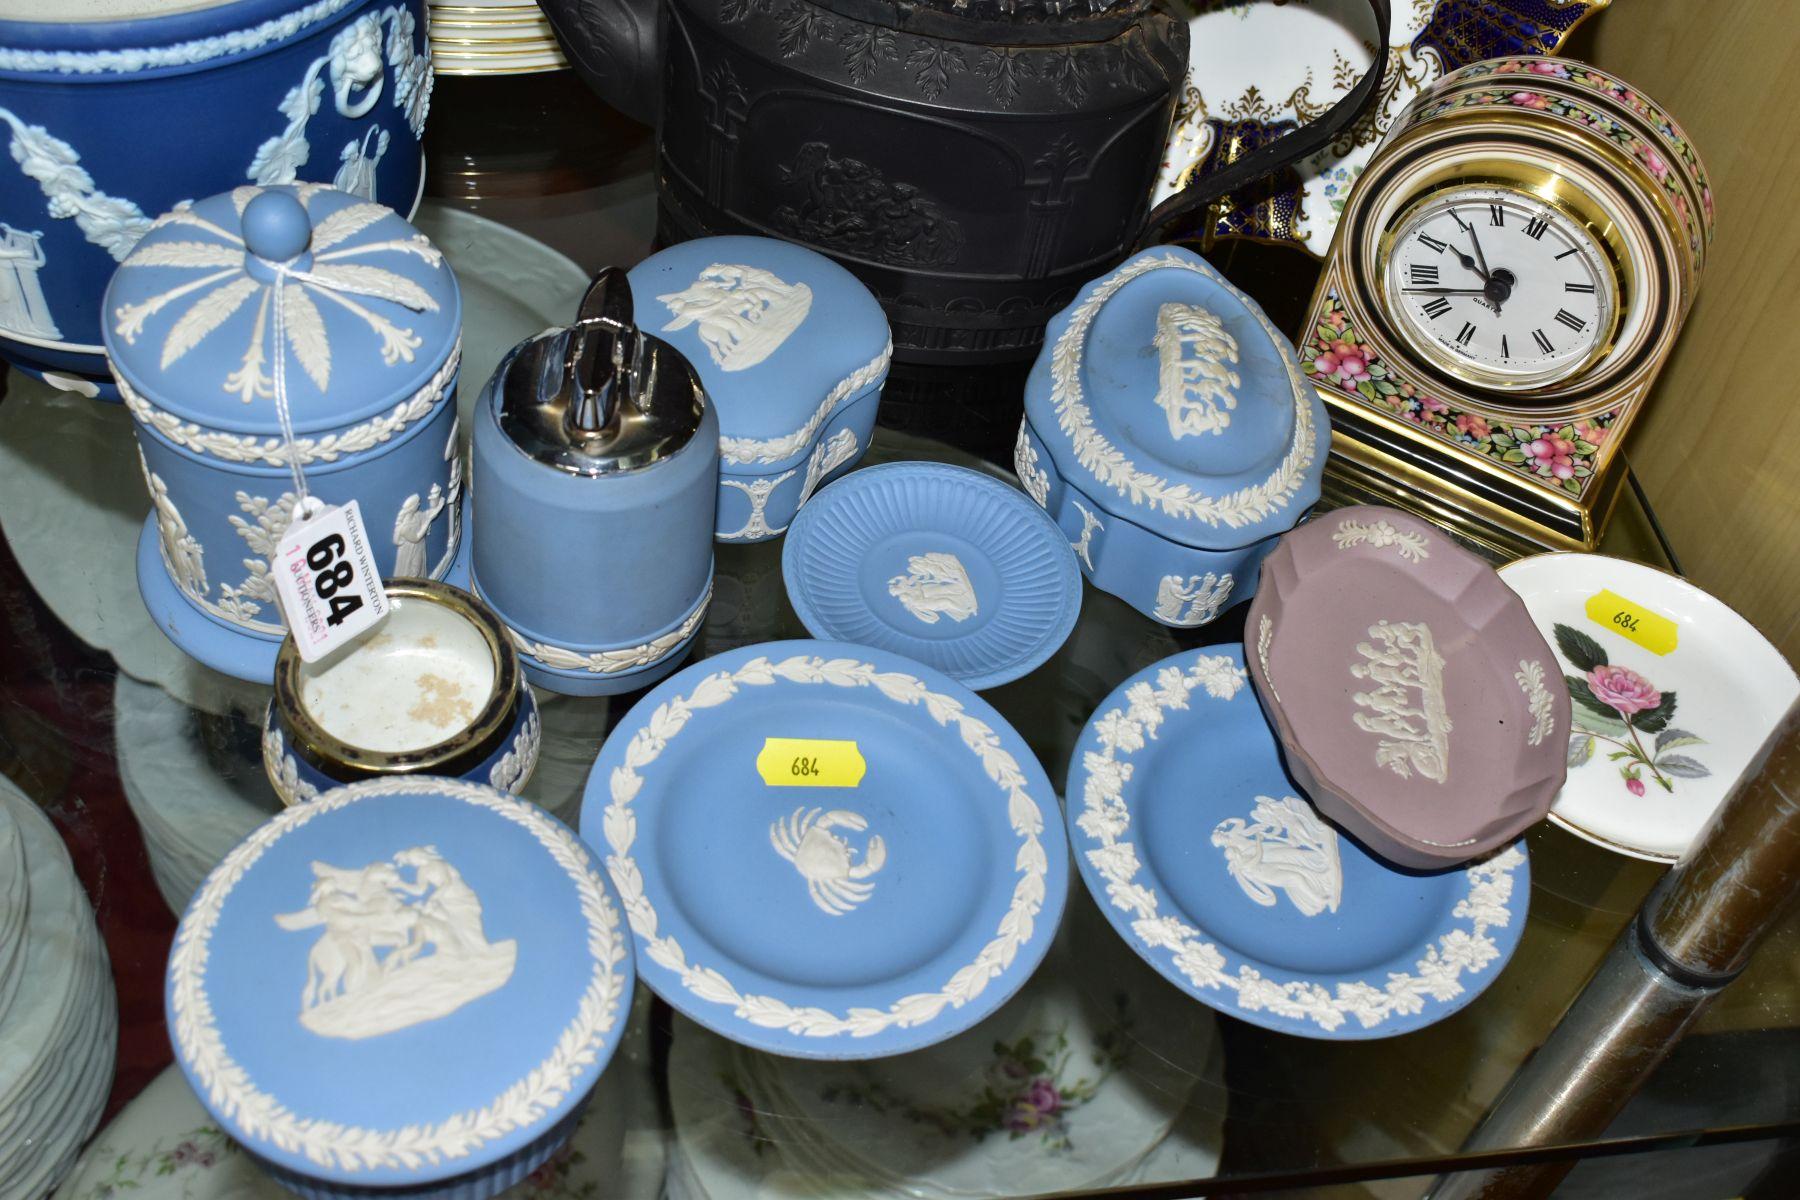 CERAMICS to include blue jasper ware trinkets, etc, Wedgwood Clio clock, black basalt teapot with - Image 8 of 8